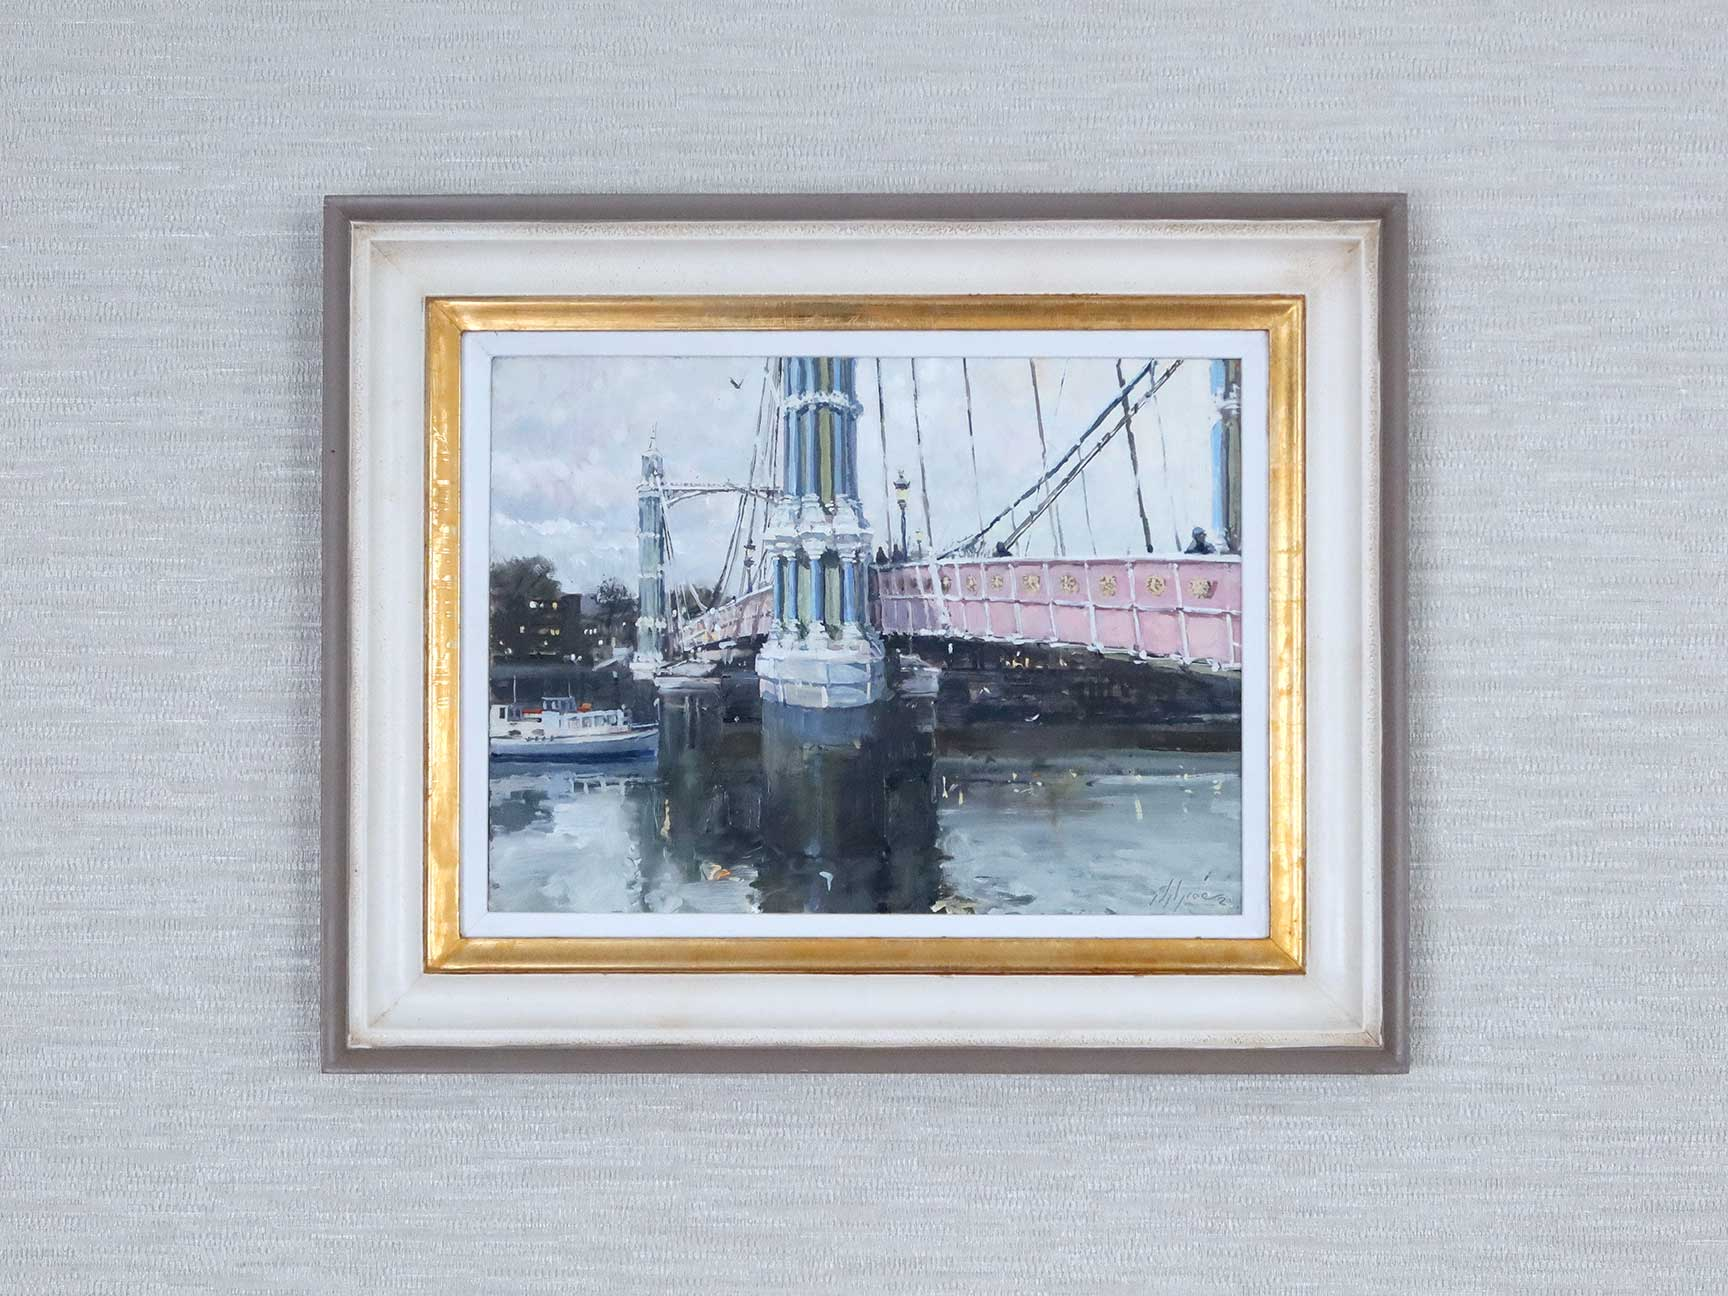 Albert Bridge, London, painting by Nick Grove